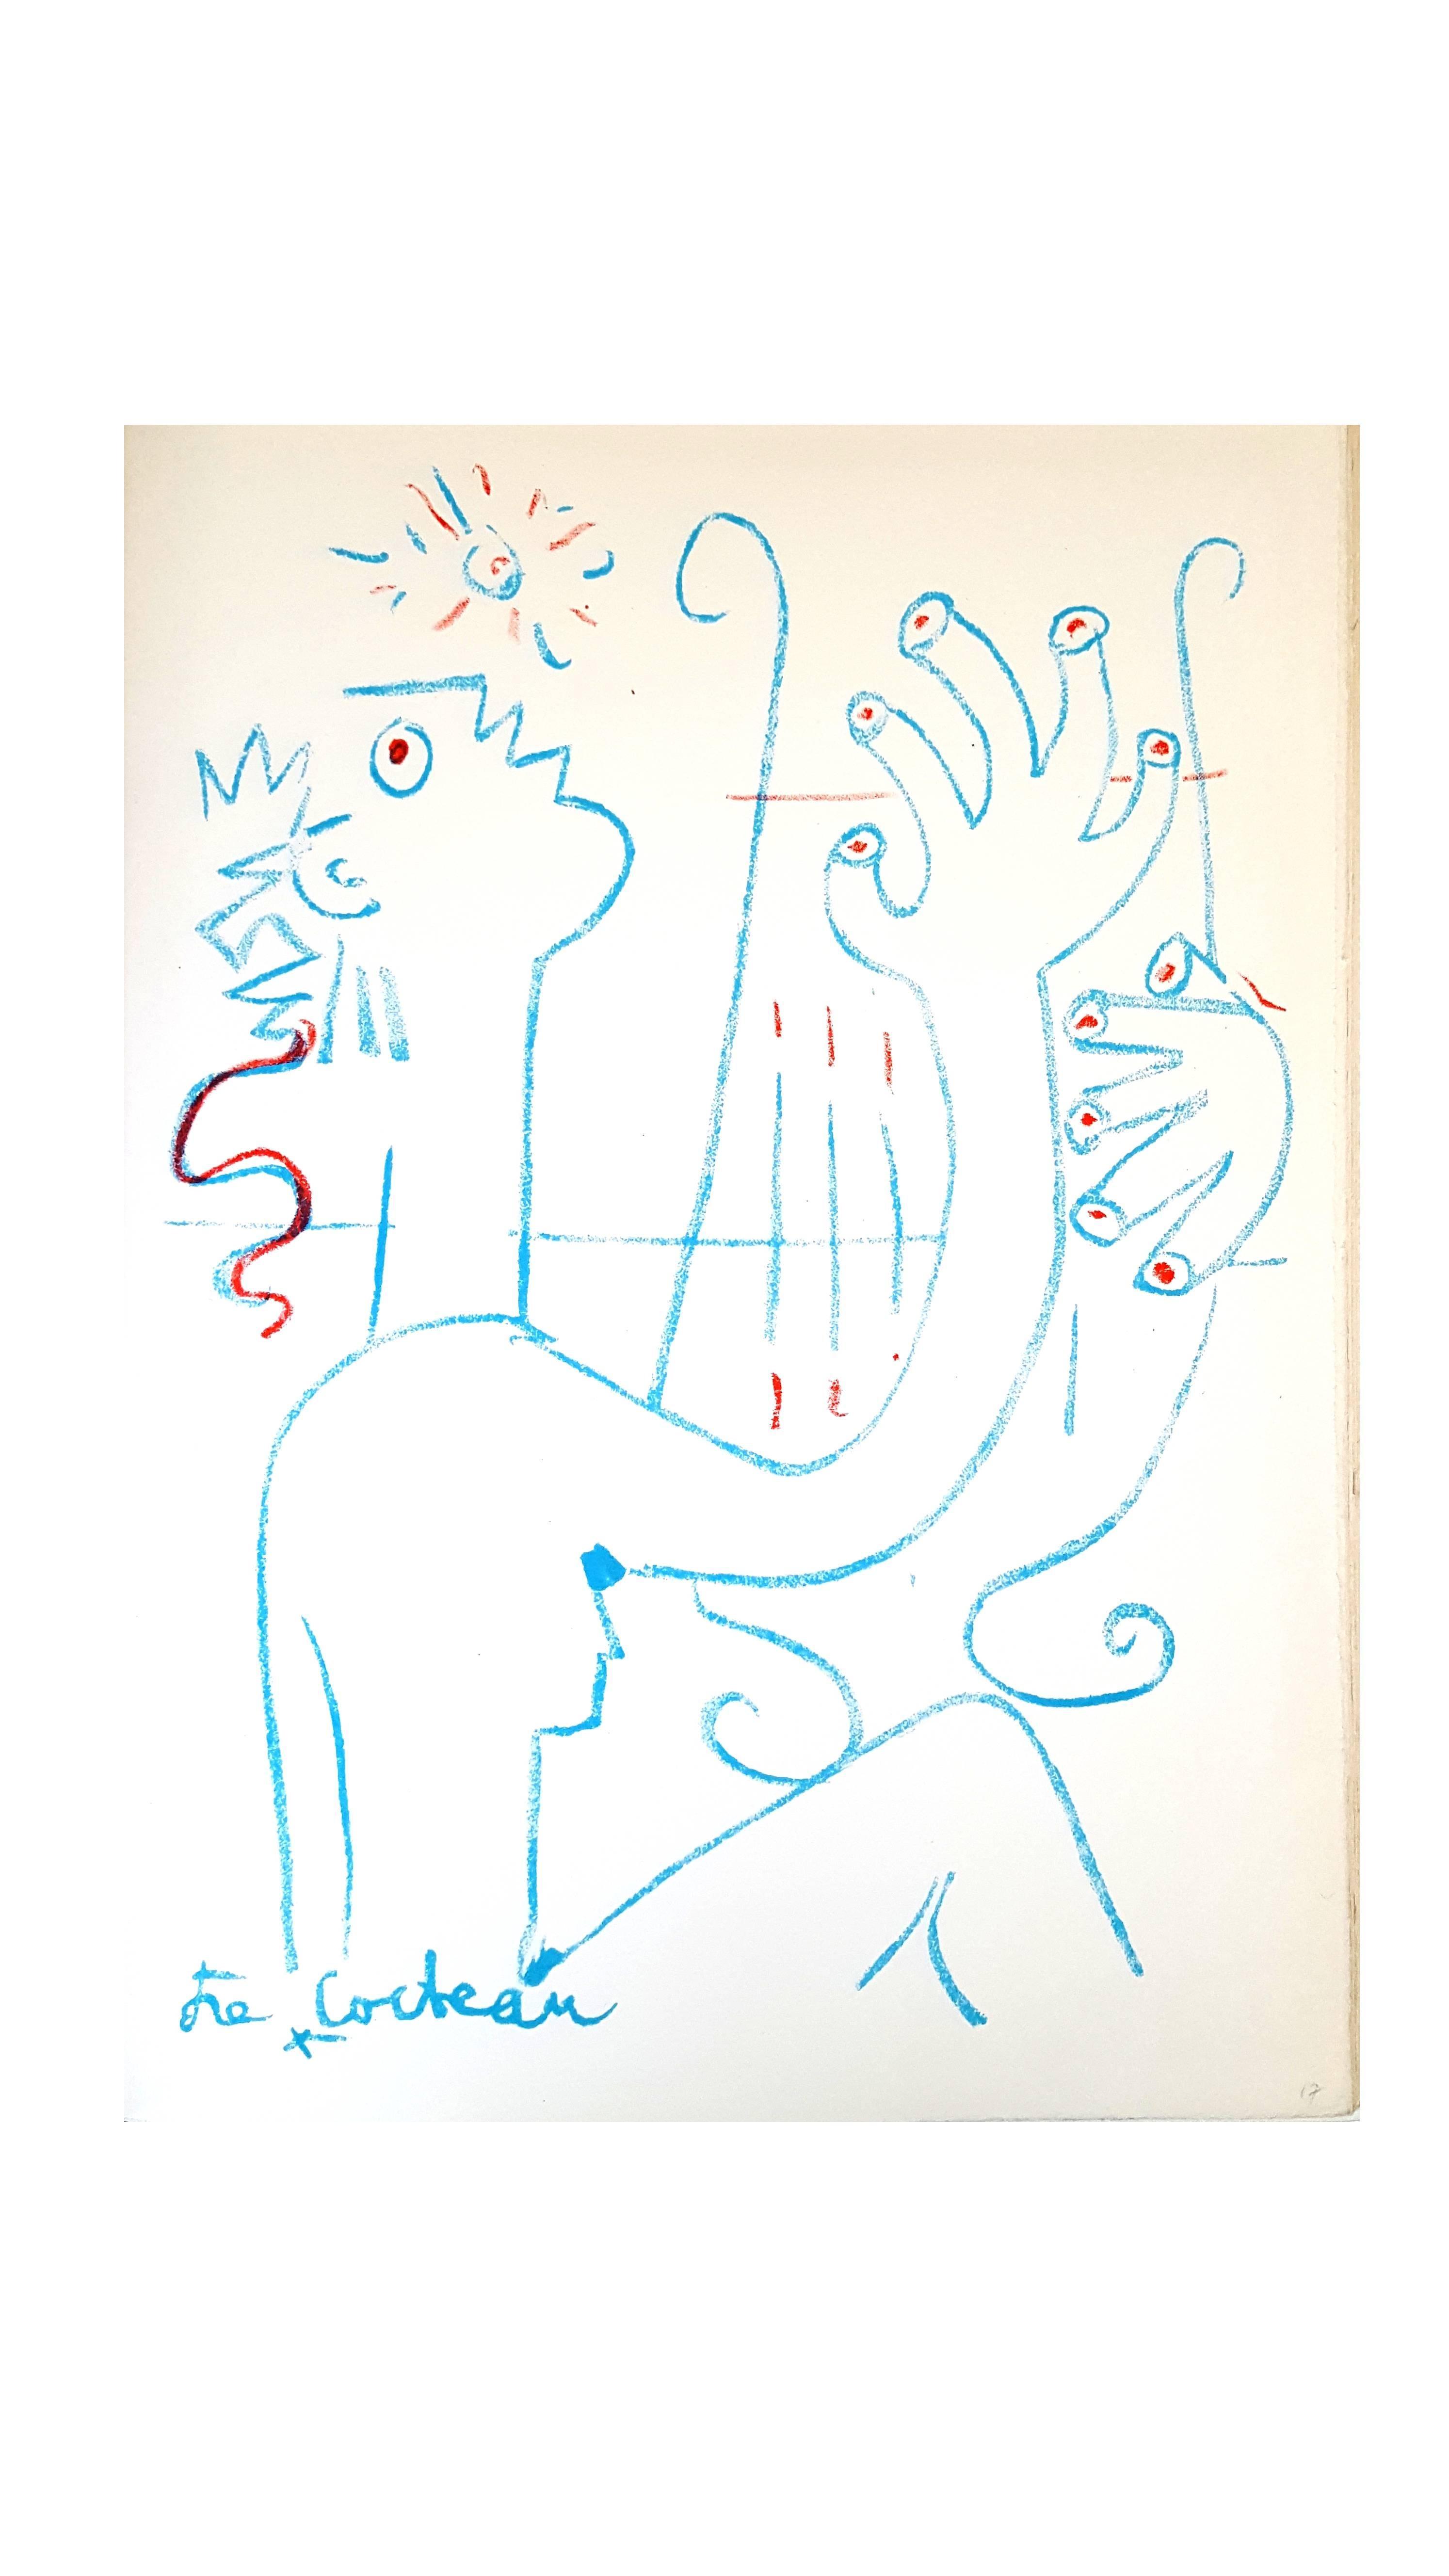 Jean Cocteau - The Musician - Original Lithograph